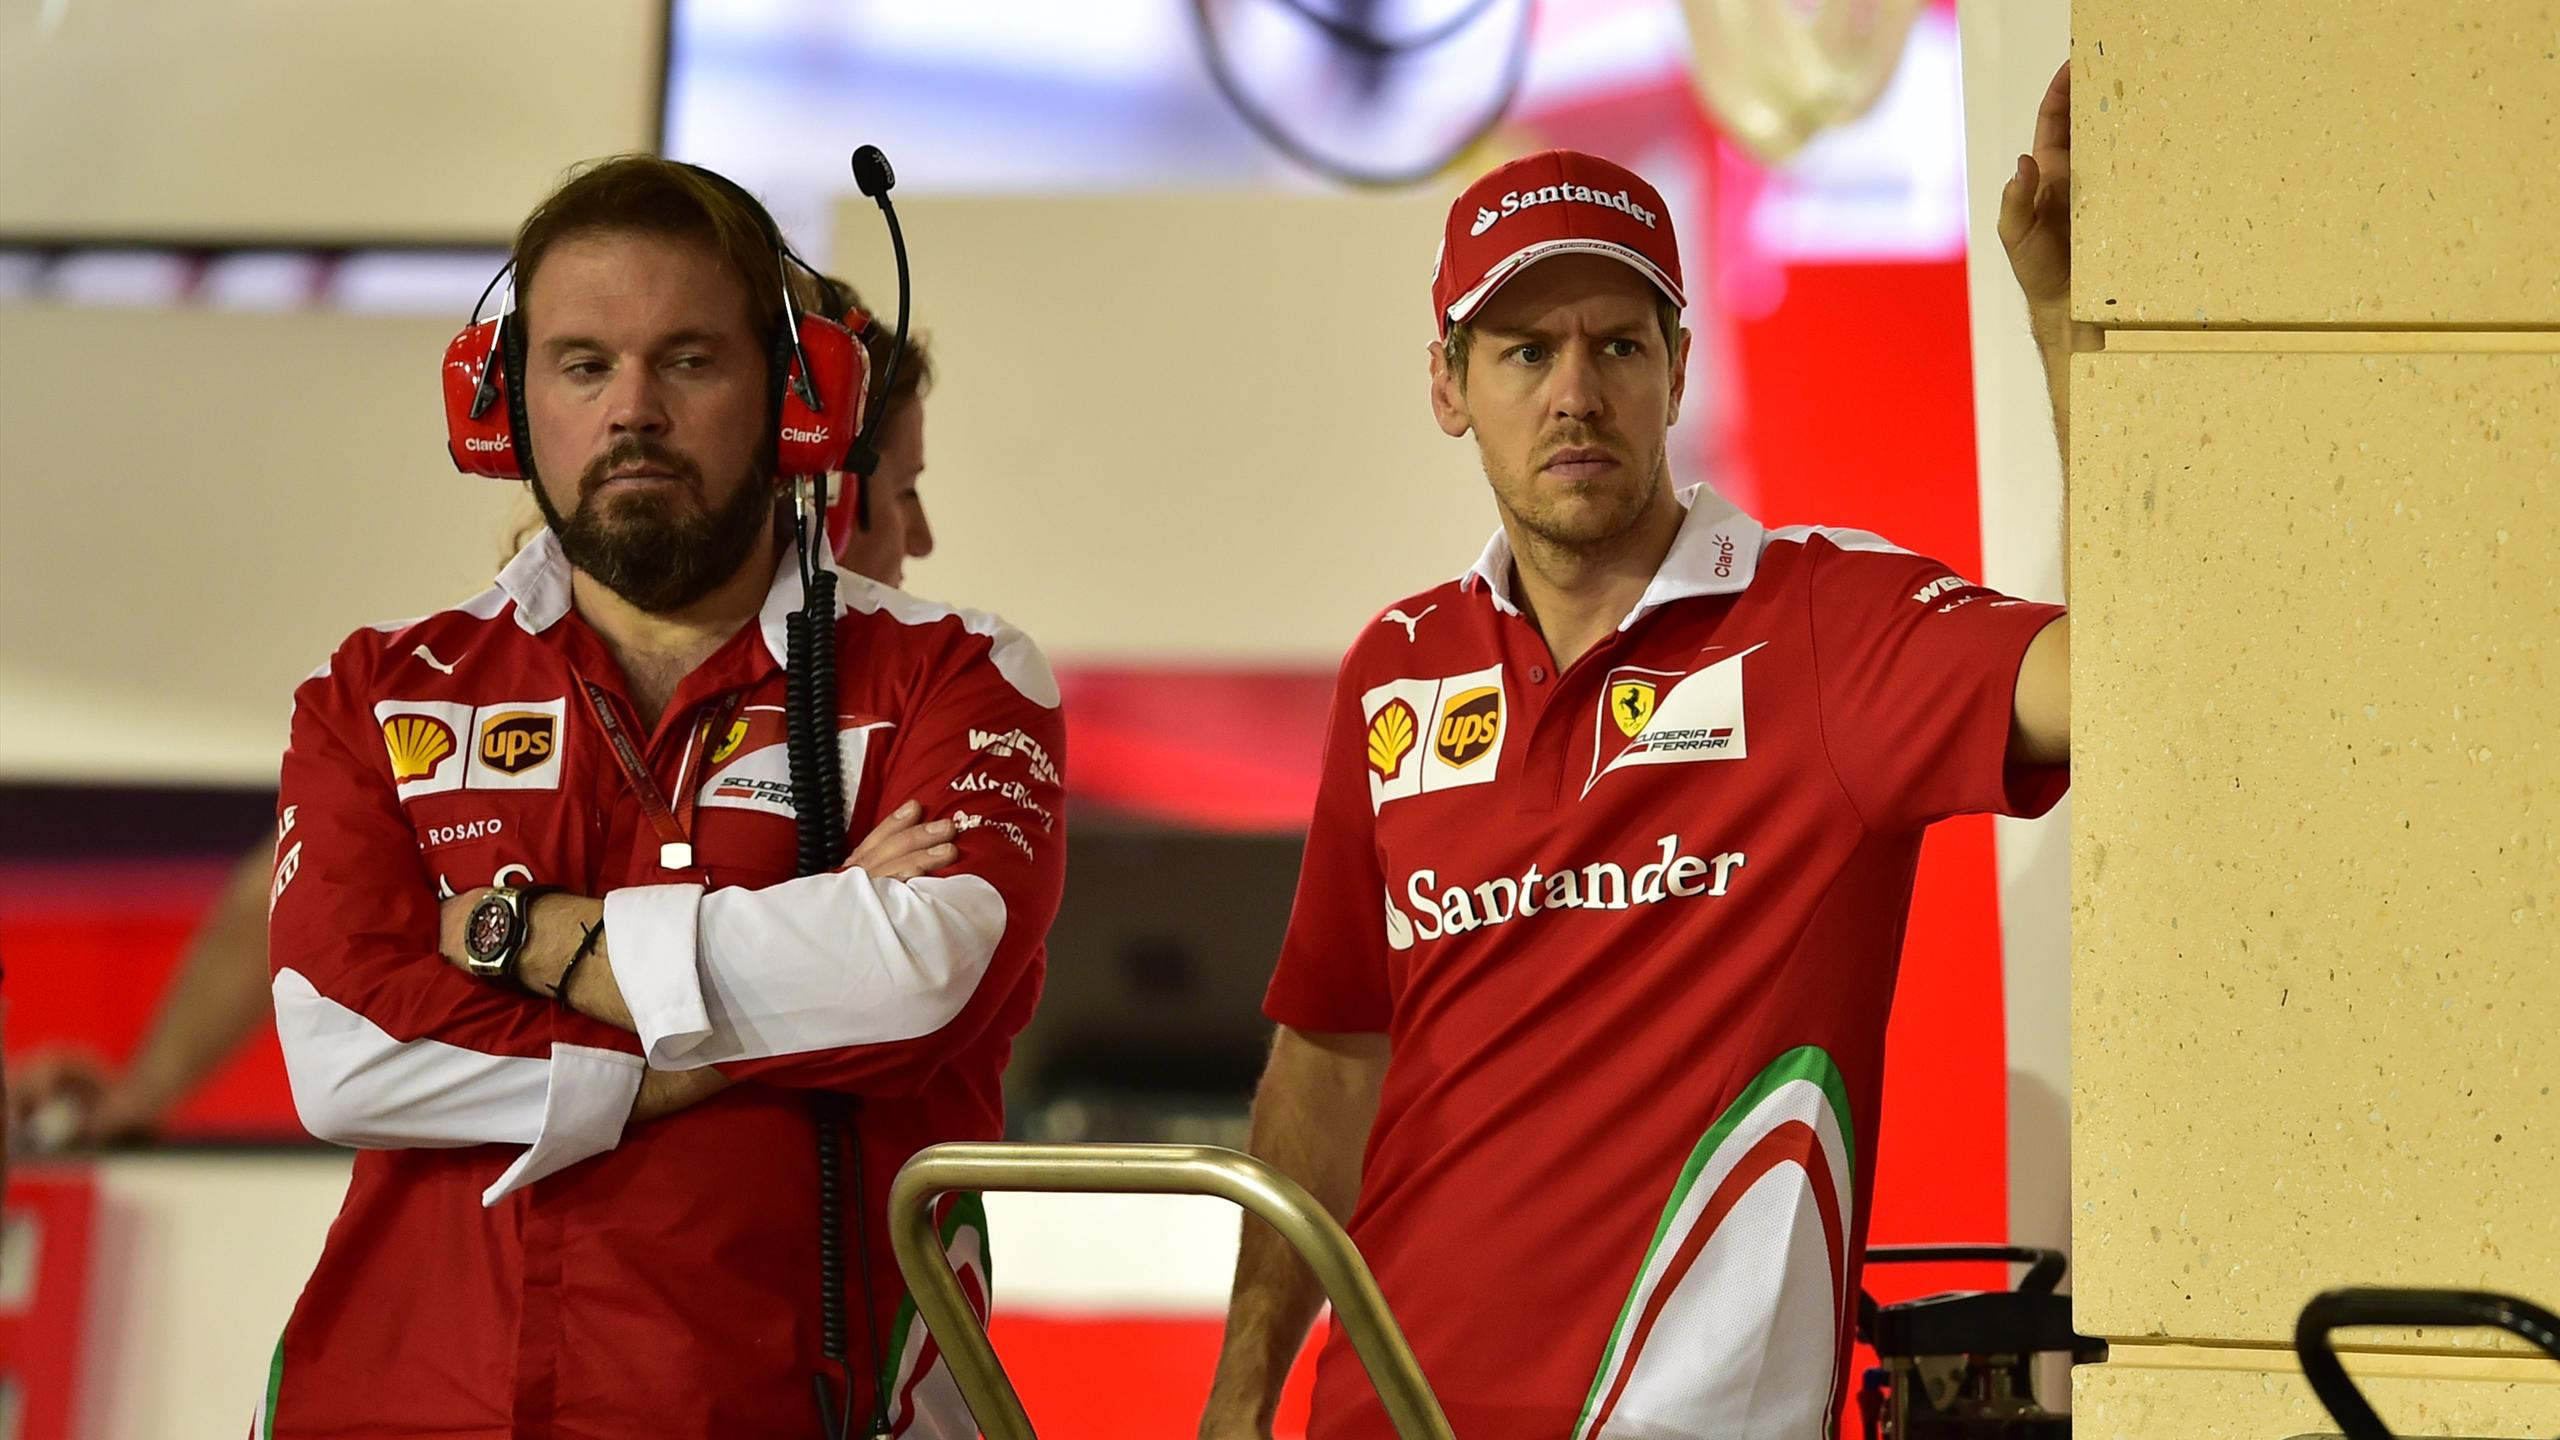 Sebastian Vettel (Ferrari) - GP of Barhain 2016